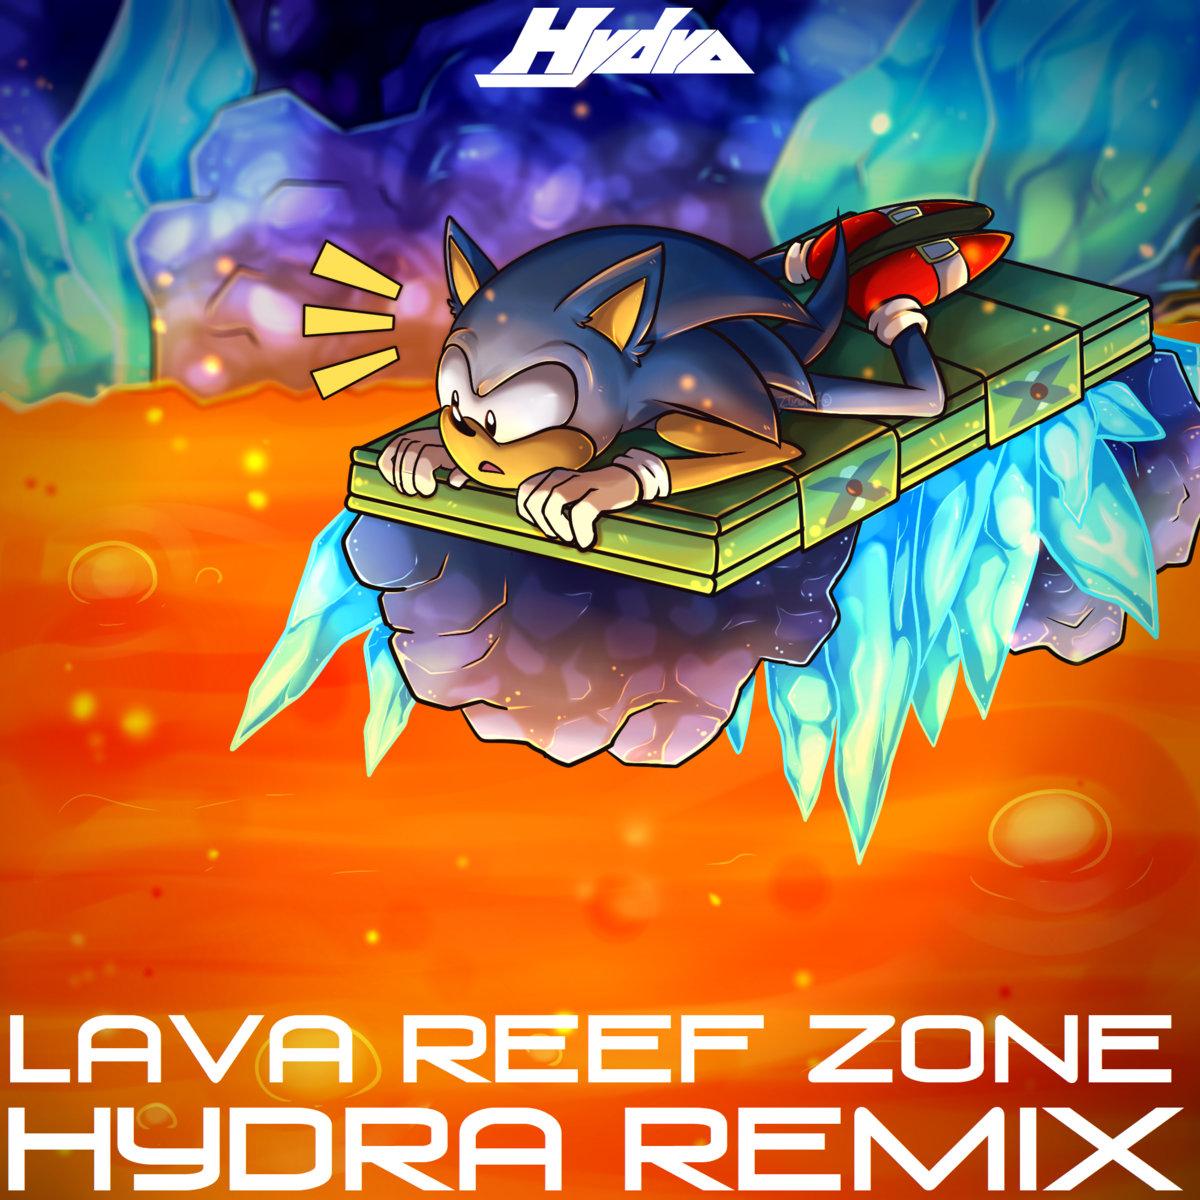 Lava Reef Zone (Hydra Remix) | Hydra